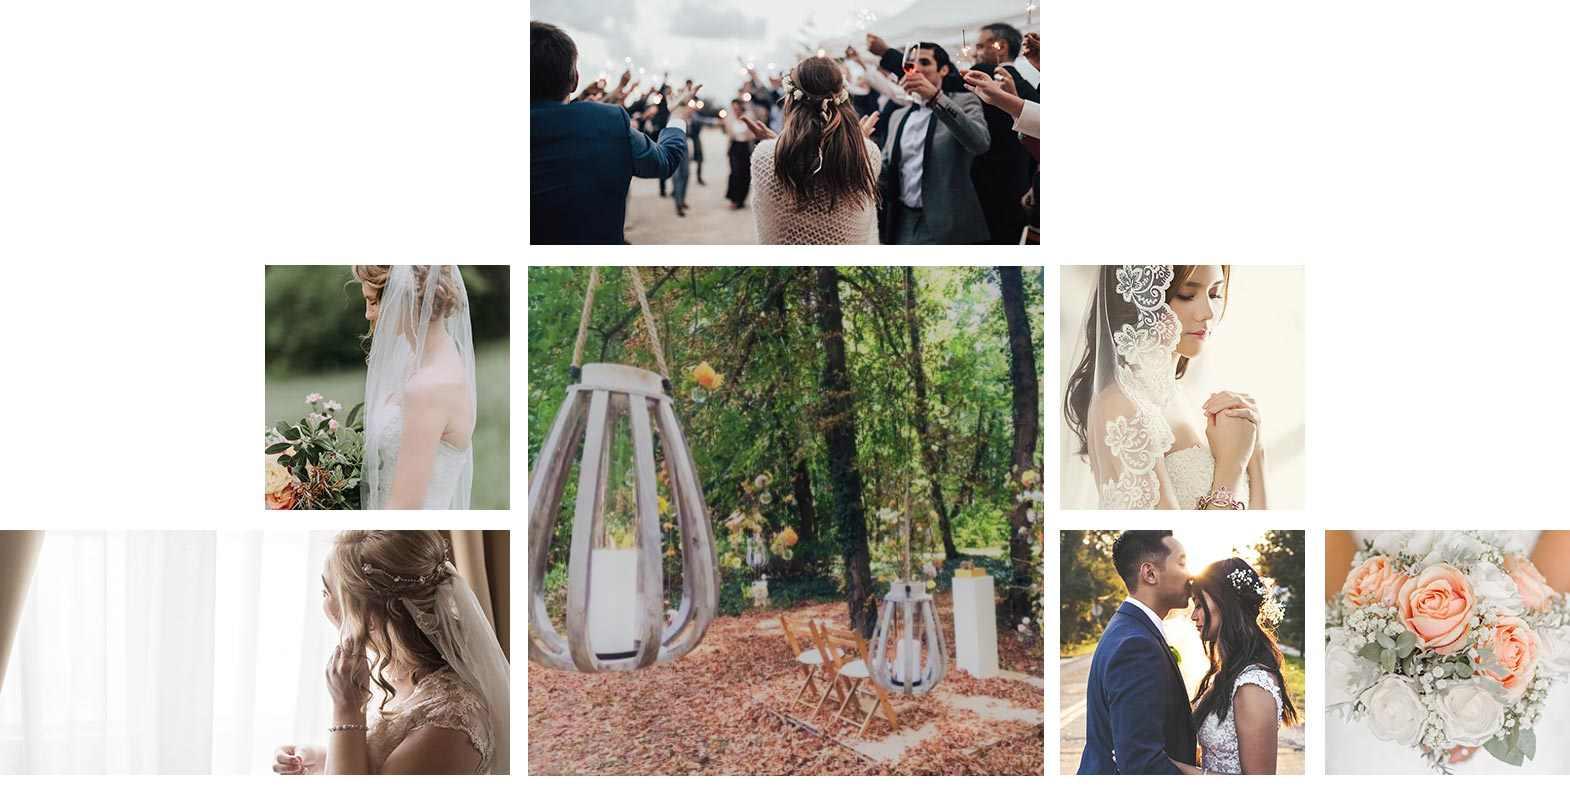 winterhochzeit_eventschloss-schoenfeld_collage